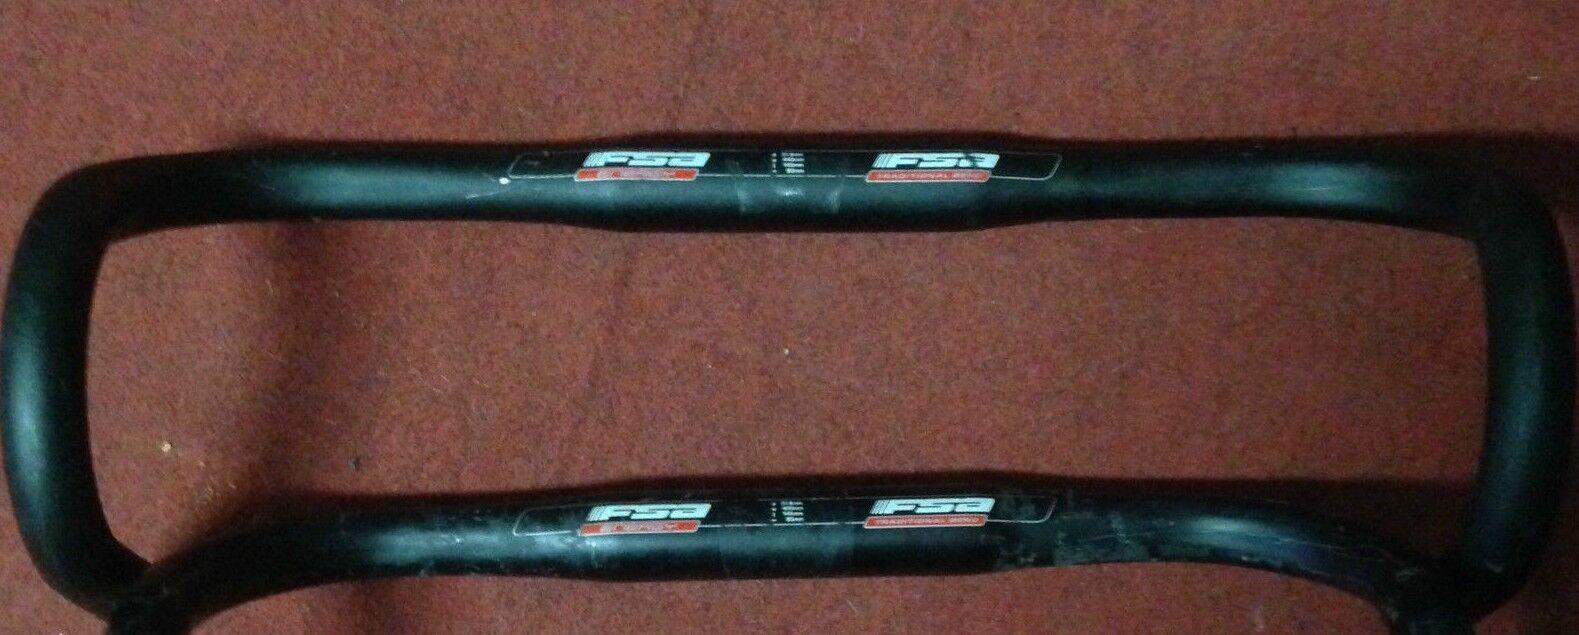 Manubrio bici corsa FSA Energy 44 31.8 road bike handlebar alluminio